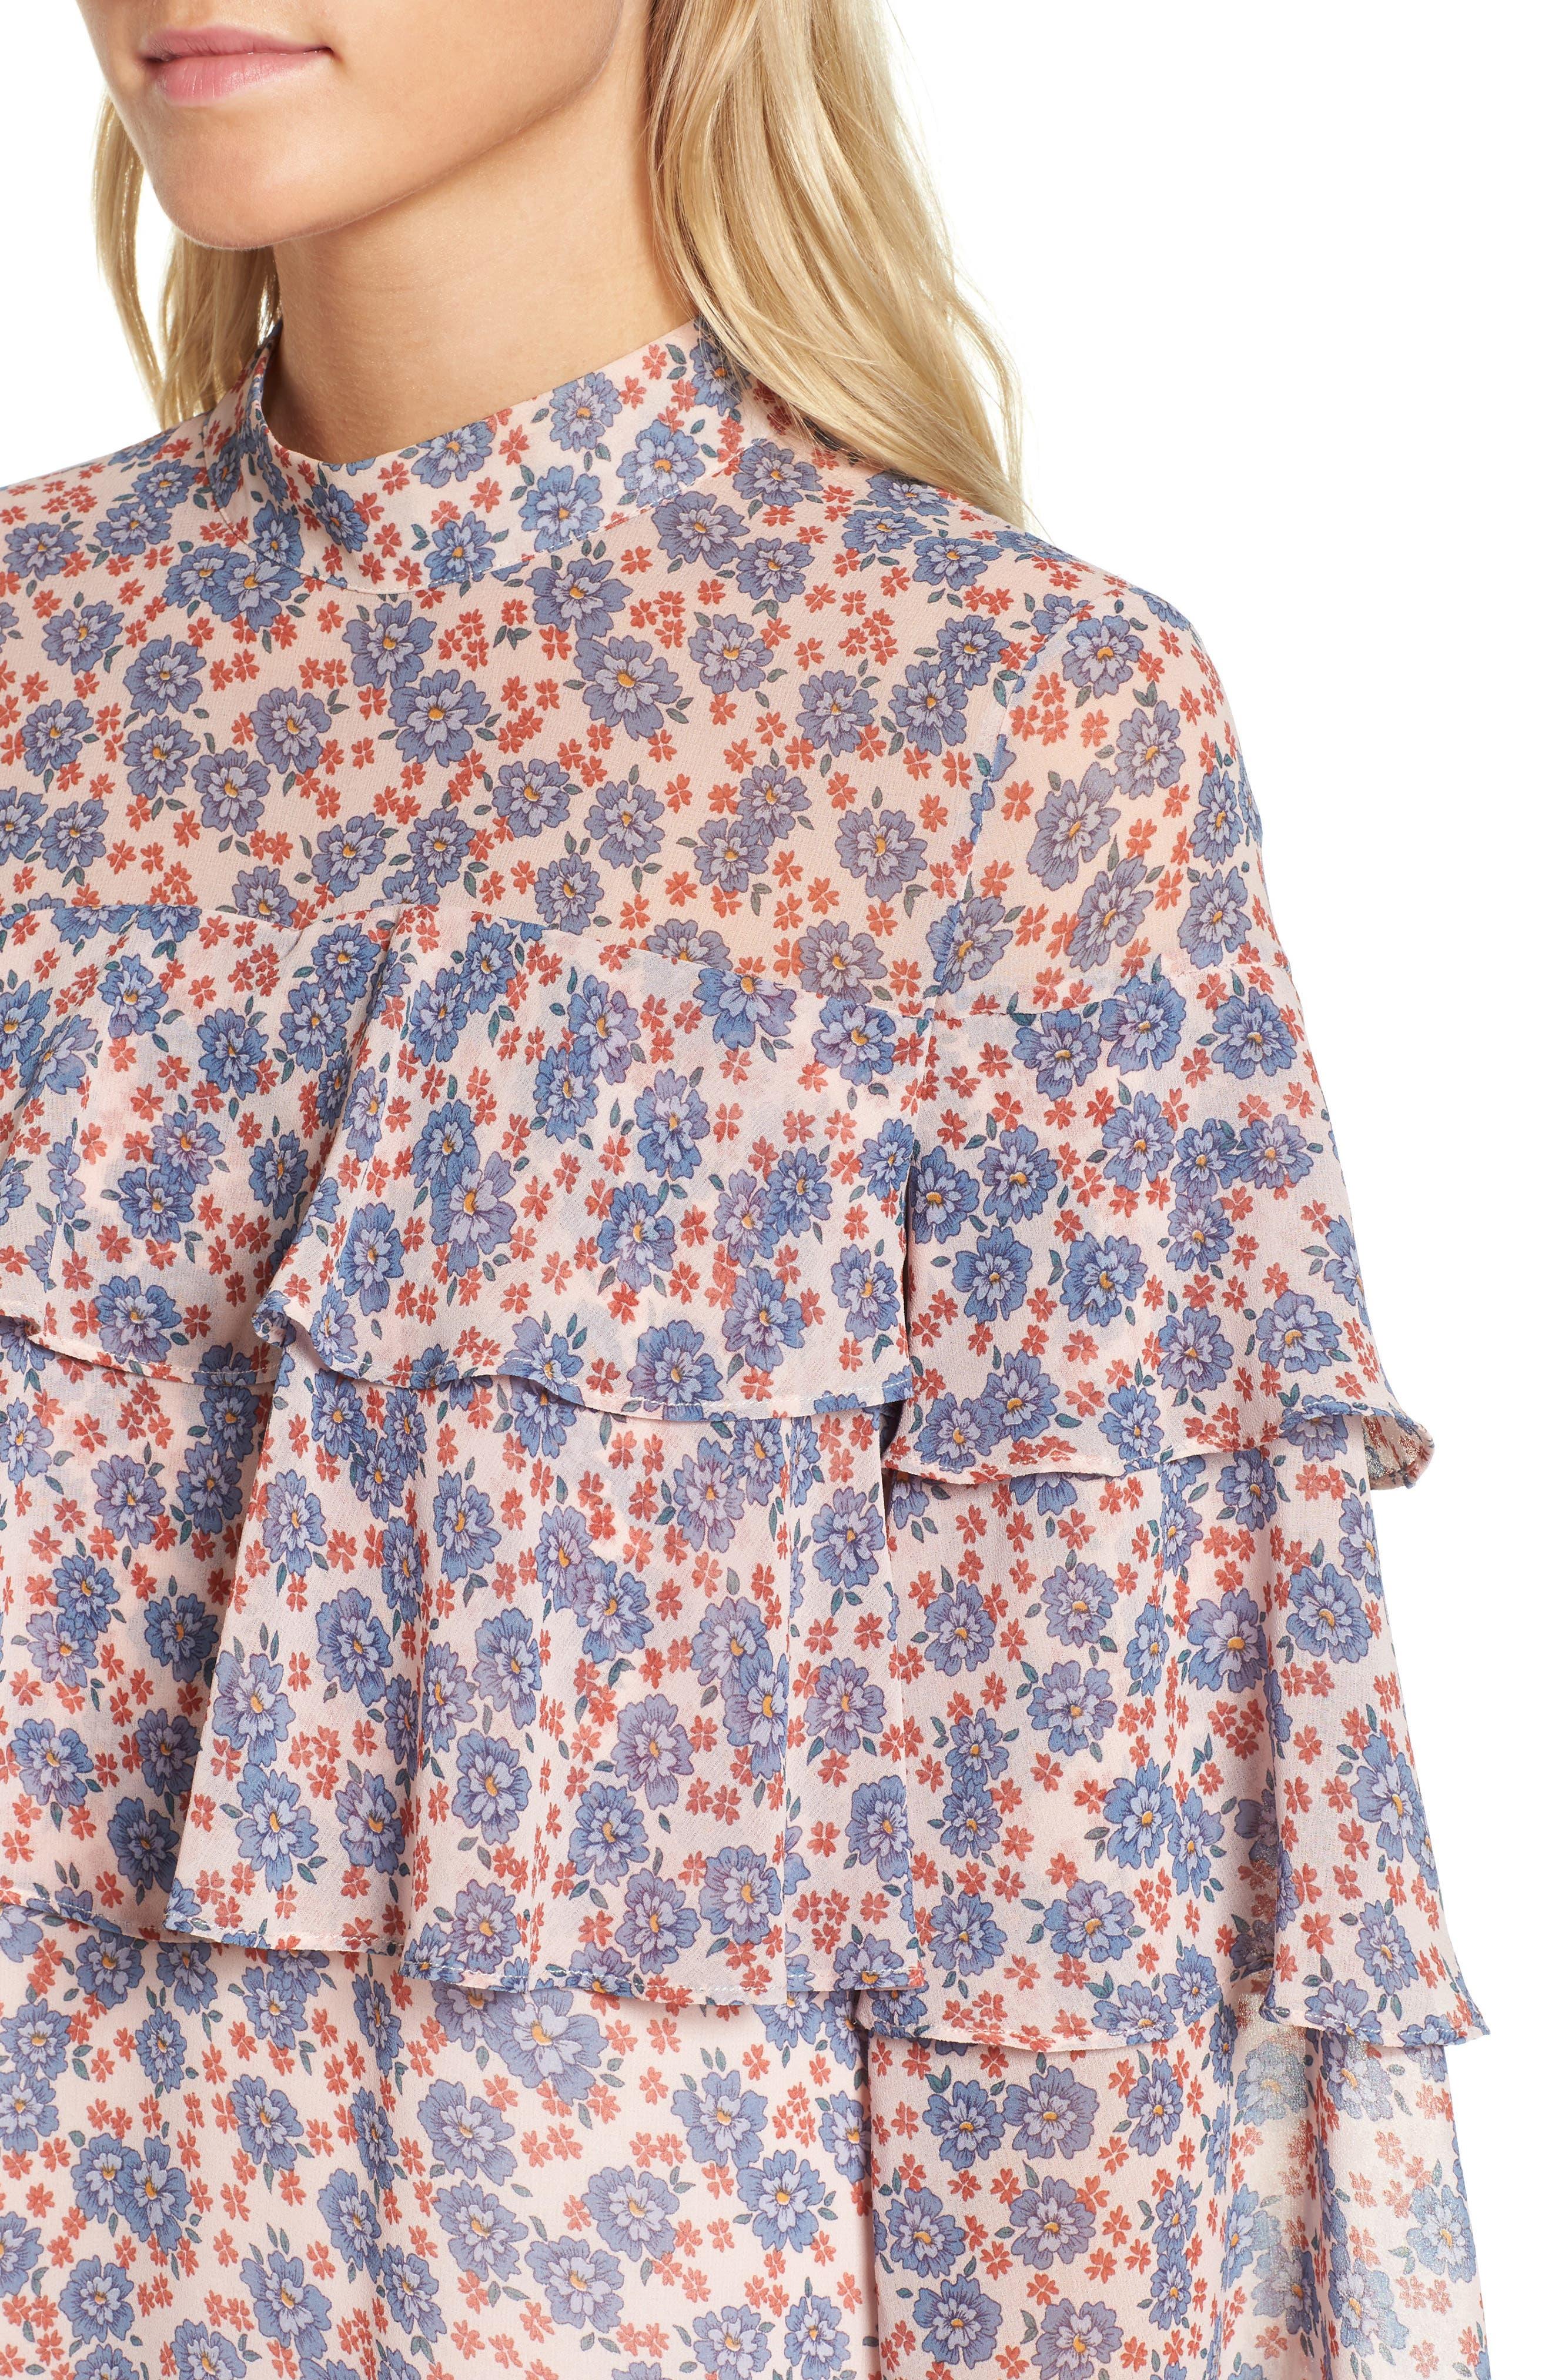 Darcy Ruffle Dress,                             Alternate thumbnail 4, color,                             Pink Multi